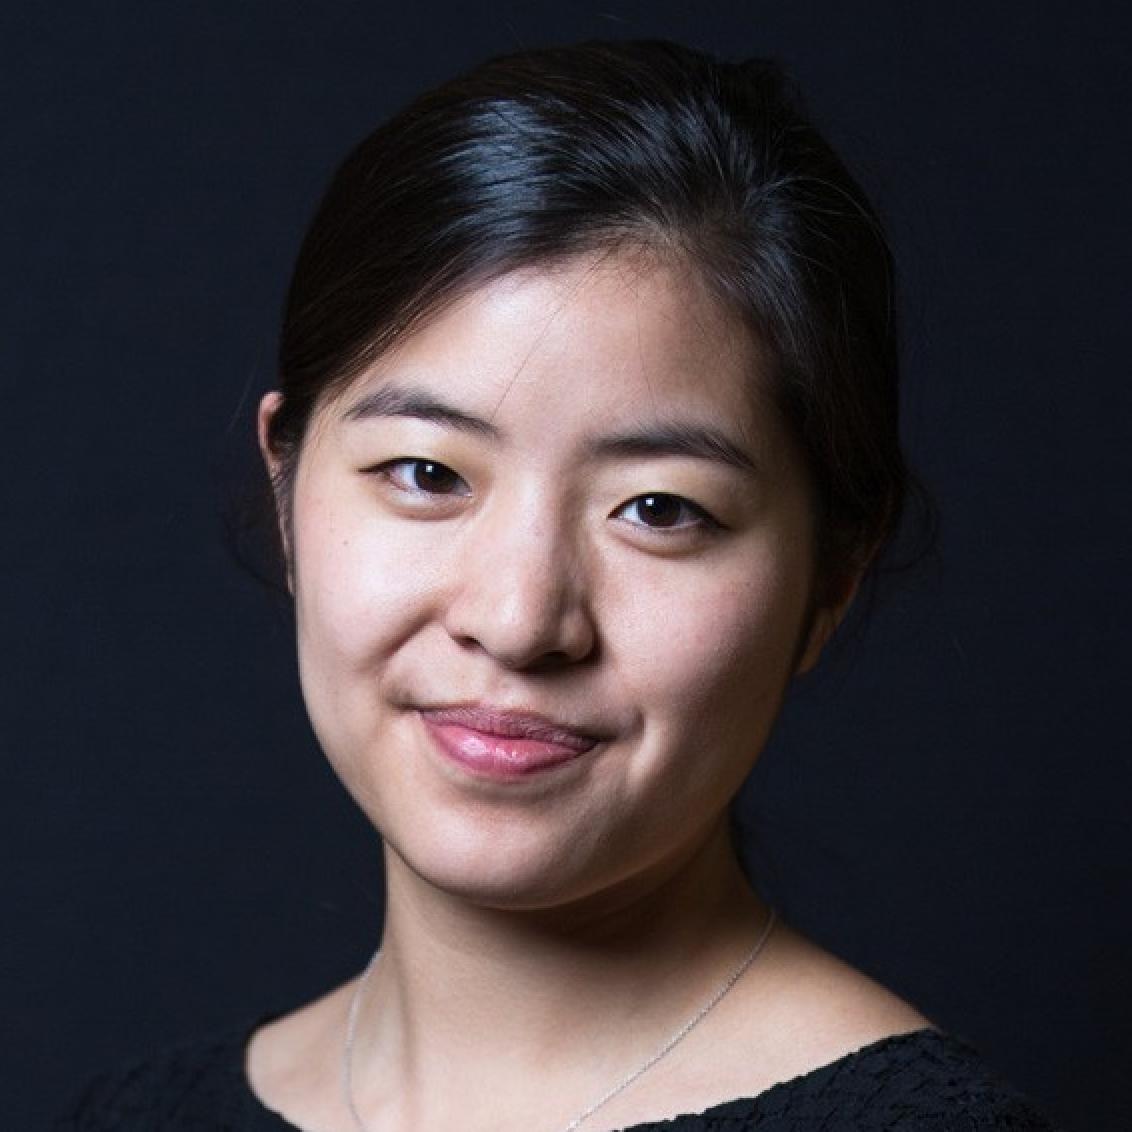 Ti Anna Wang (China)  Canadian advocate of freedom and Human Rights, daughter of Dr. Wang Bingzhang